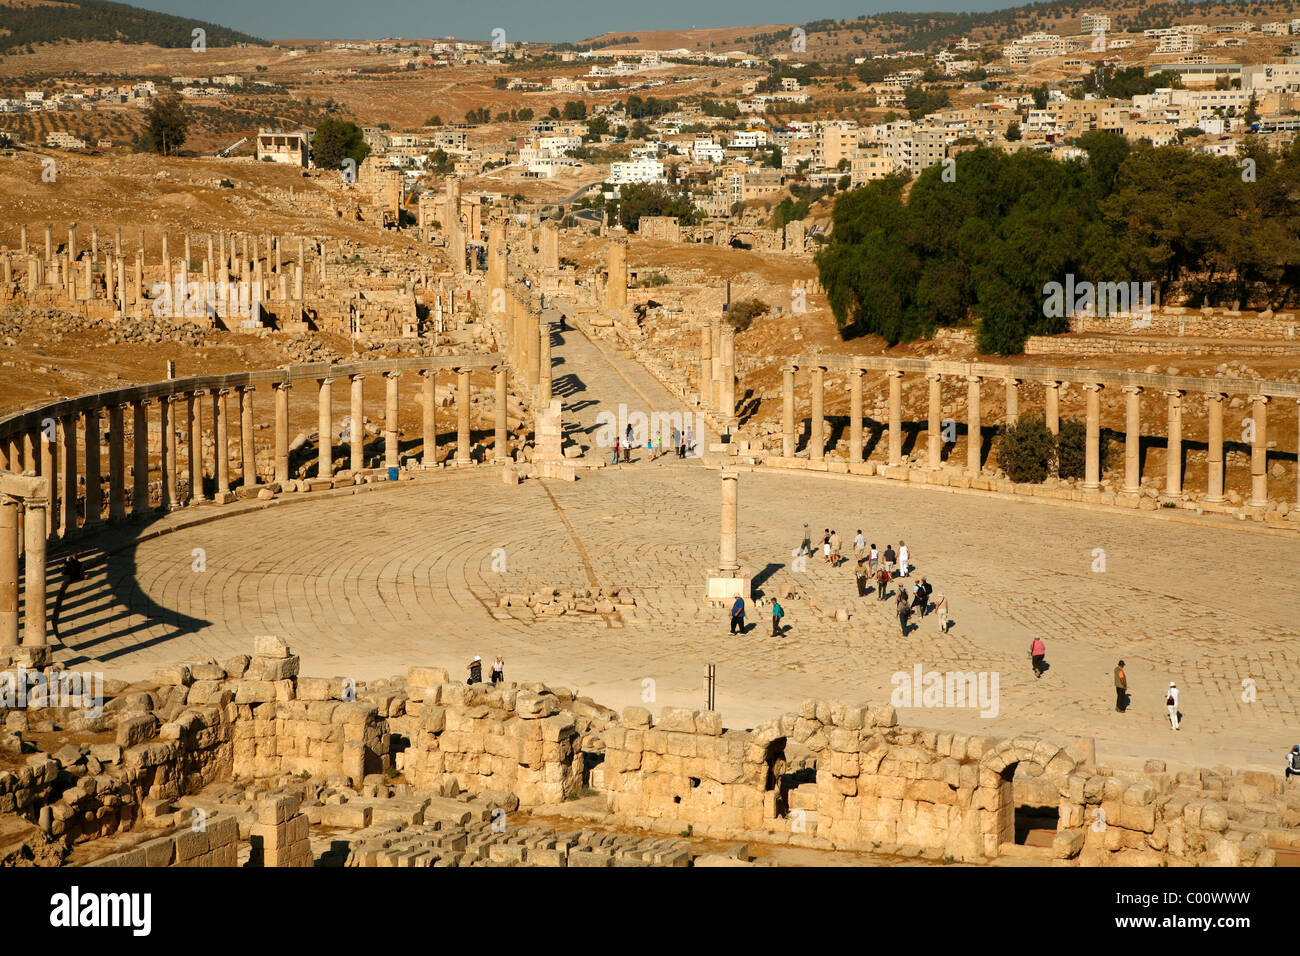 The Oval Forum, Jerash, Jordan. - Stock Image